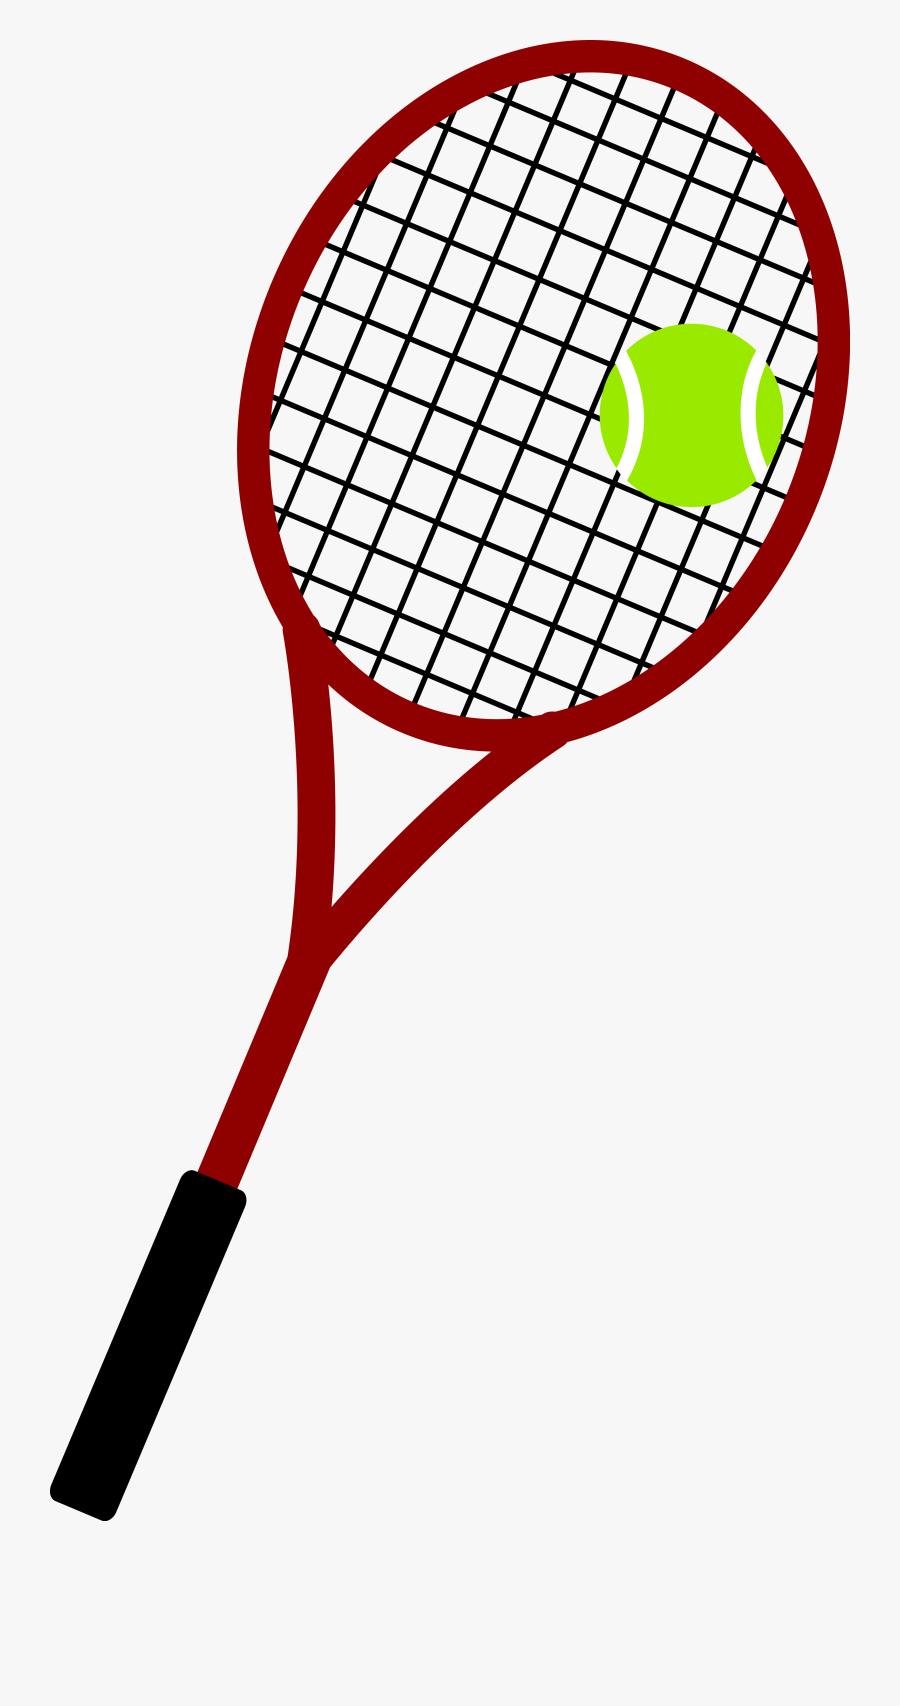 Tennis - Ball - Clipart - Tennis Ball And Racket Clipart, Transparent Clipart